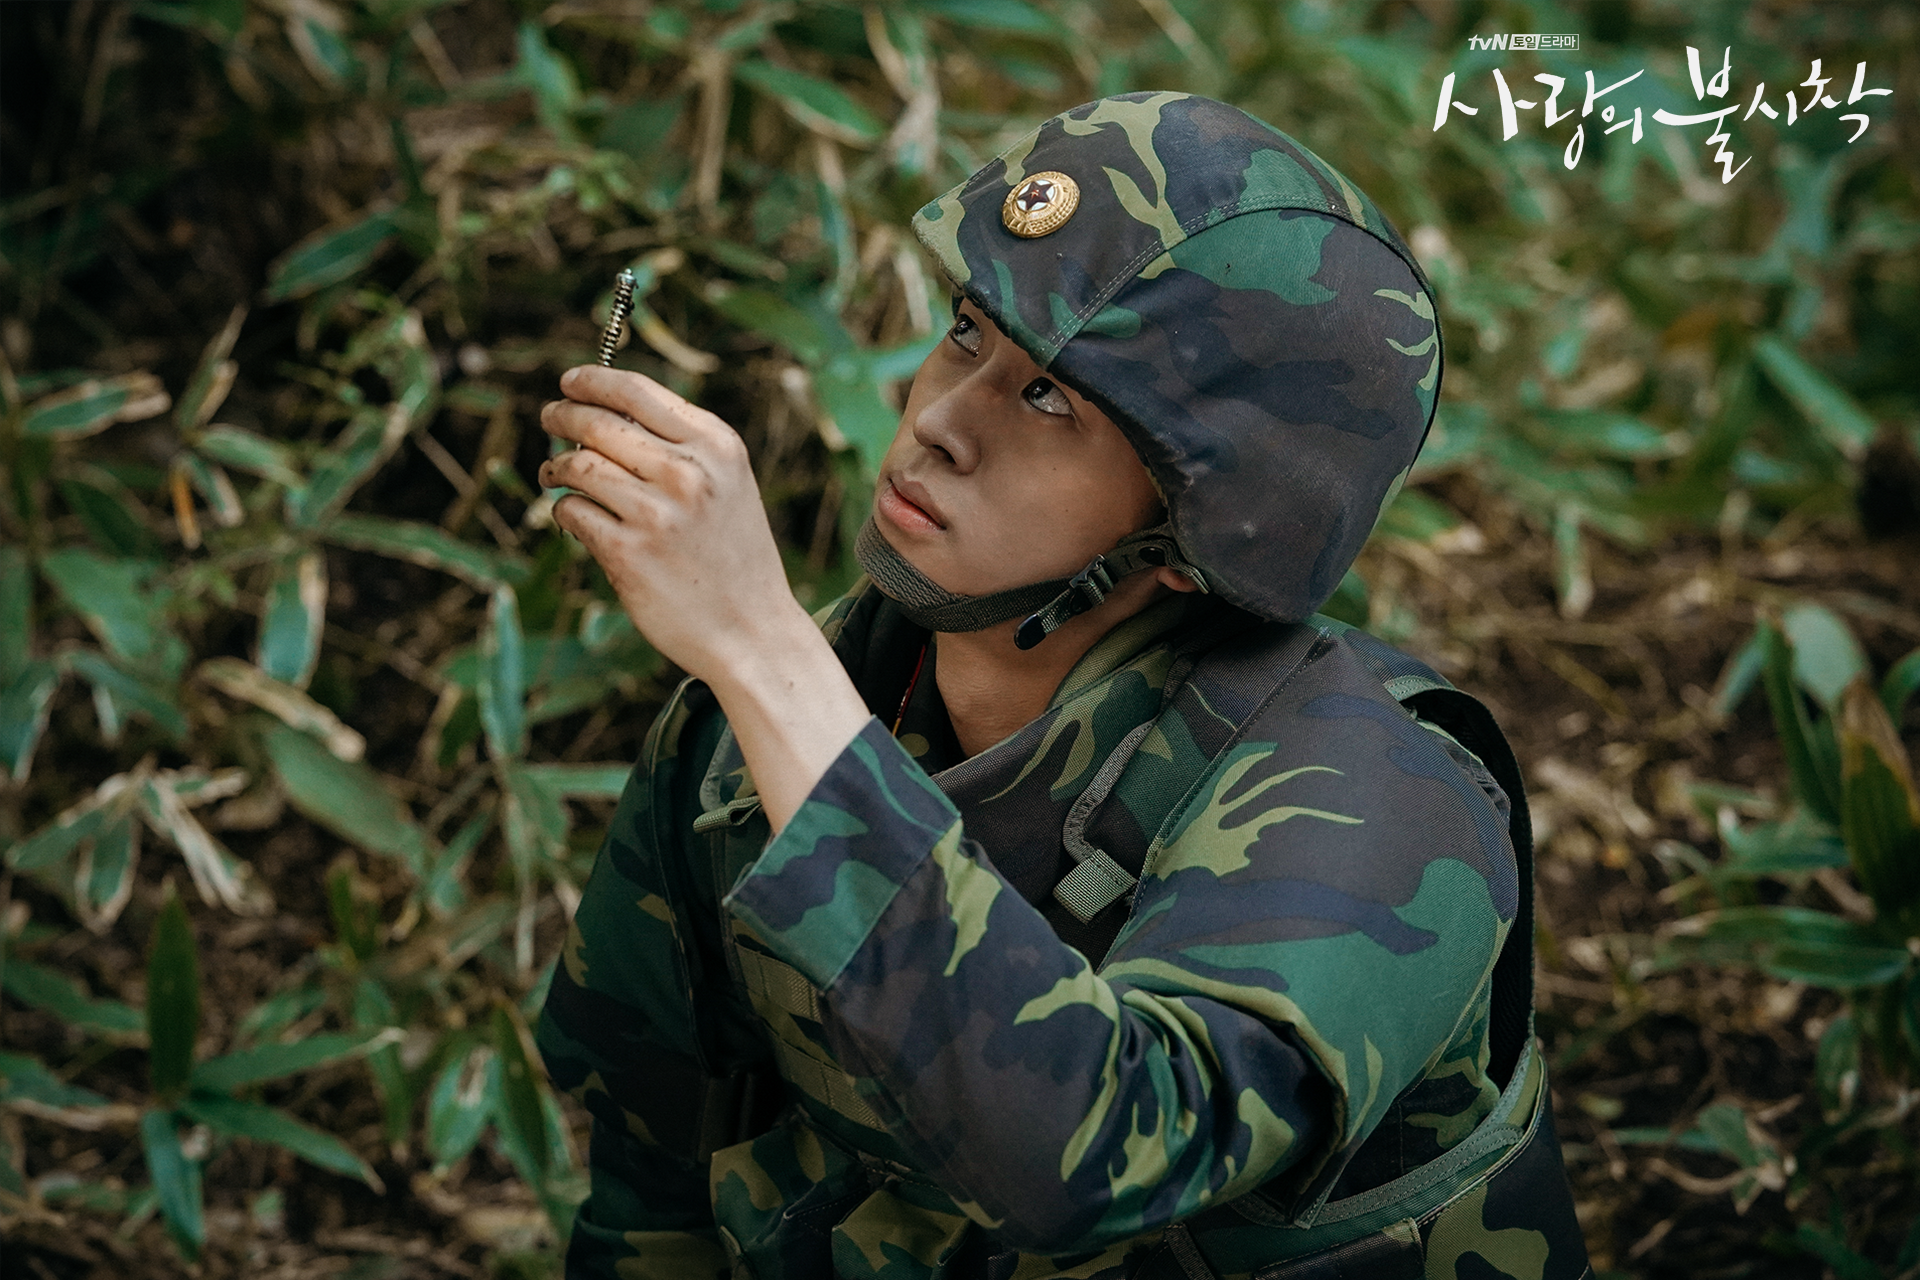 Crash Landing on You Staff Sergeant Park Kwang-beom disarming mine under Captain Ri Jeong-hyeok